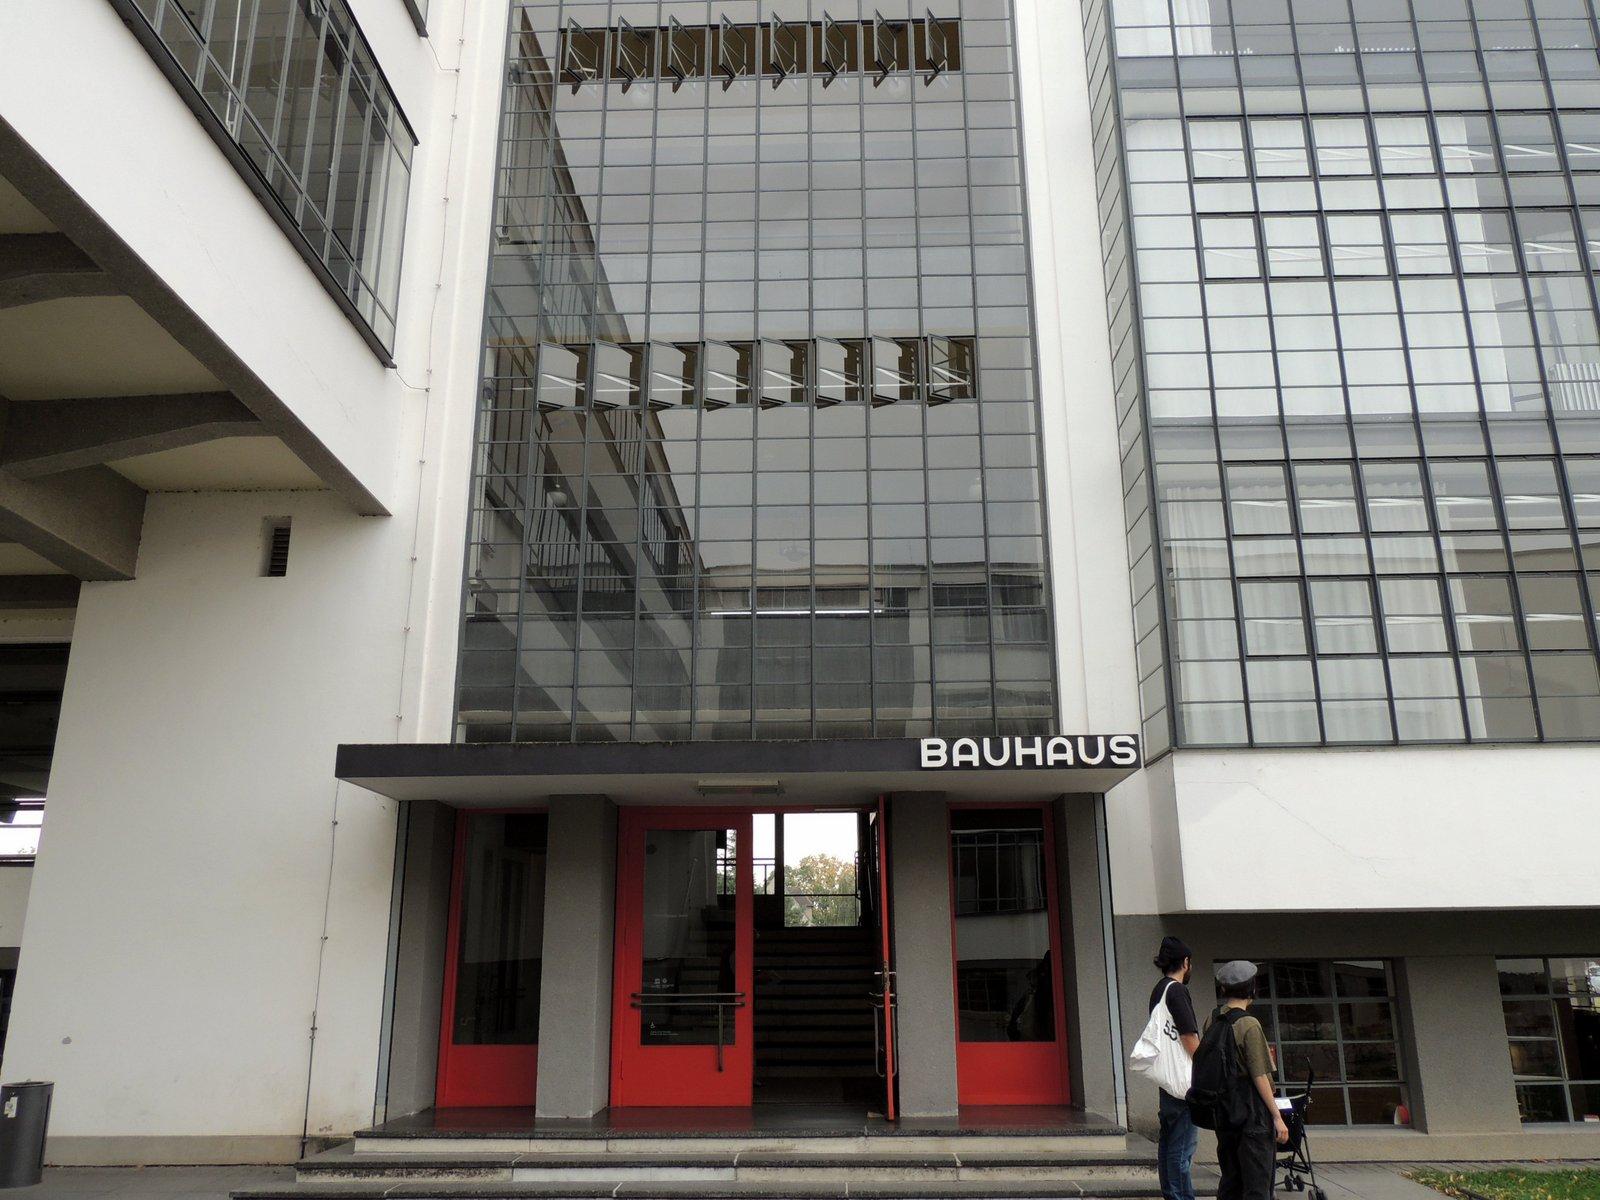 Bauhaus Dessau